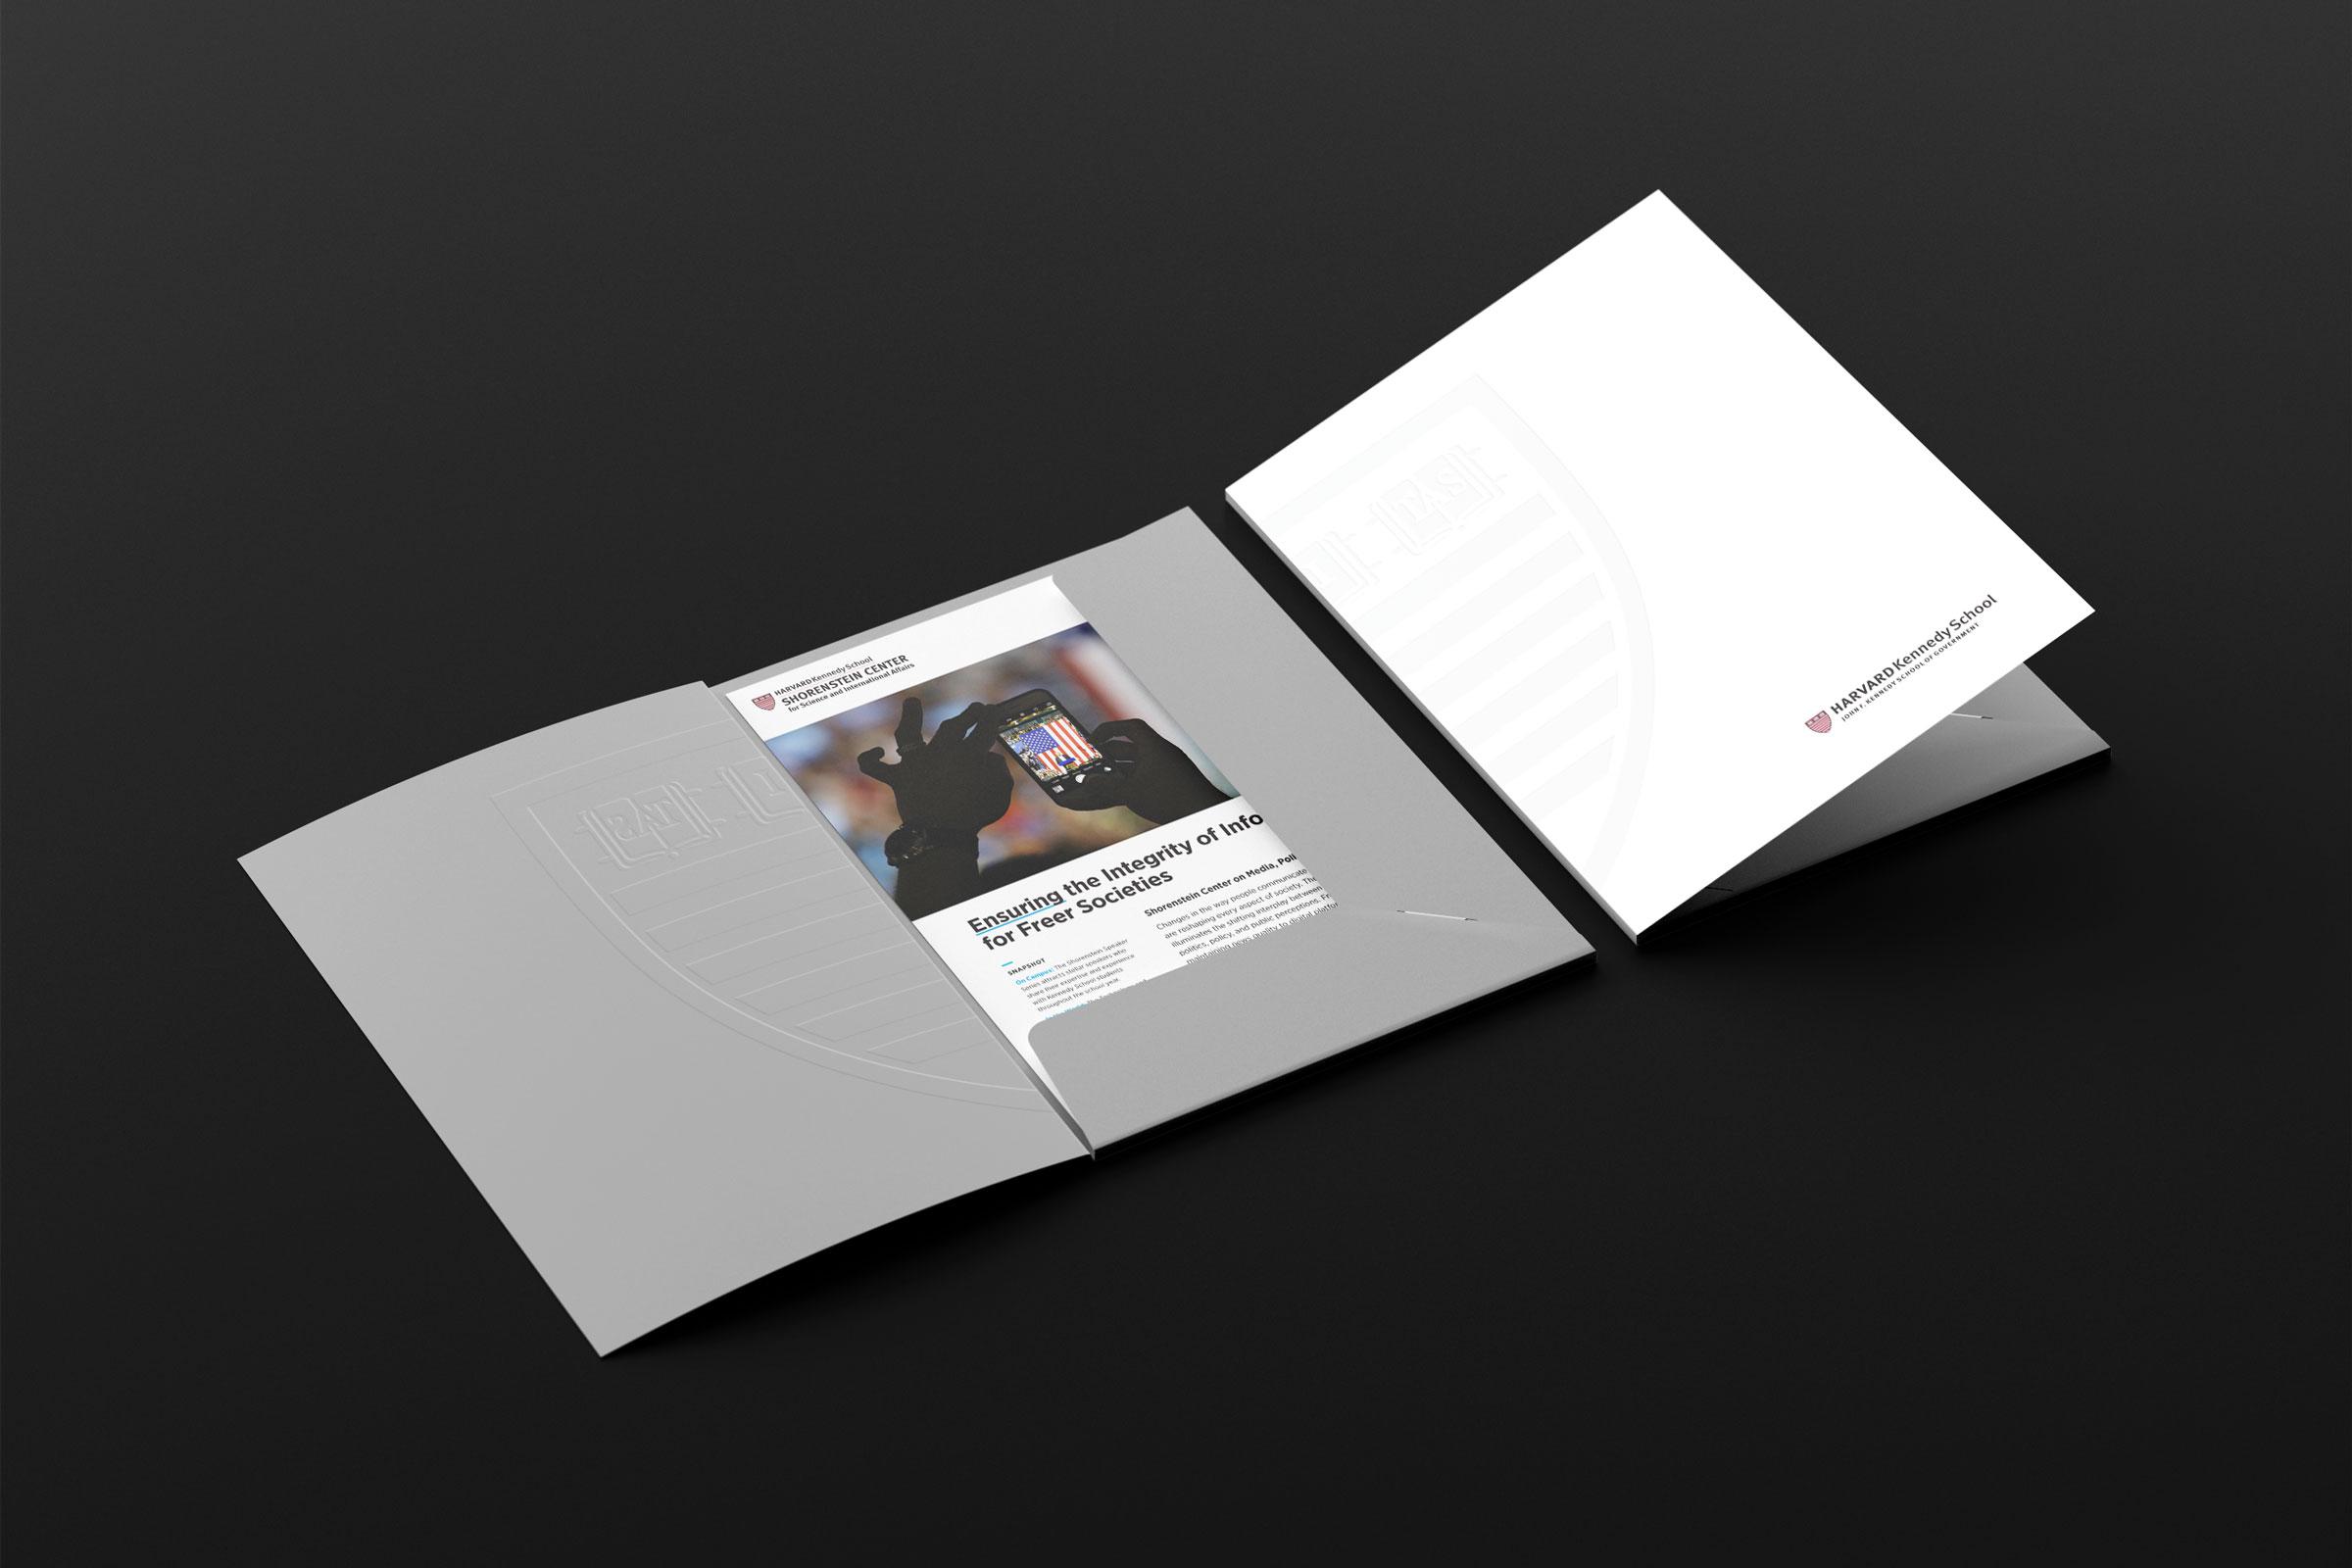 Folder_Mockup_3